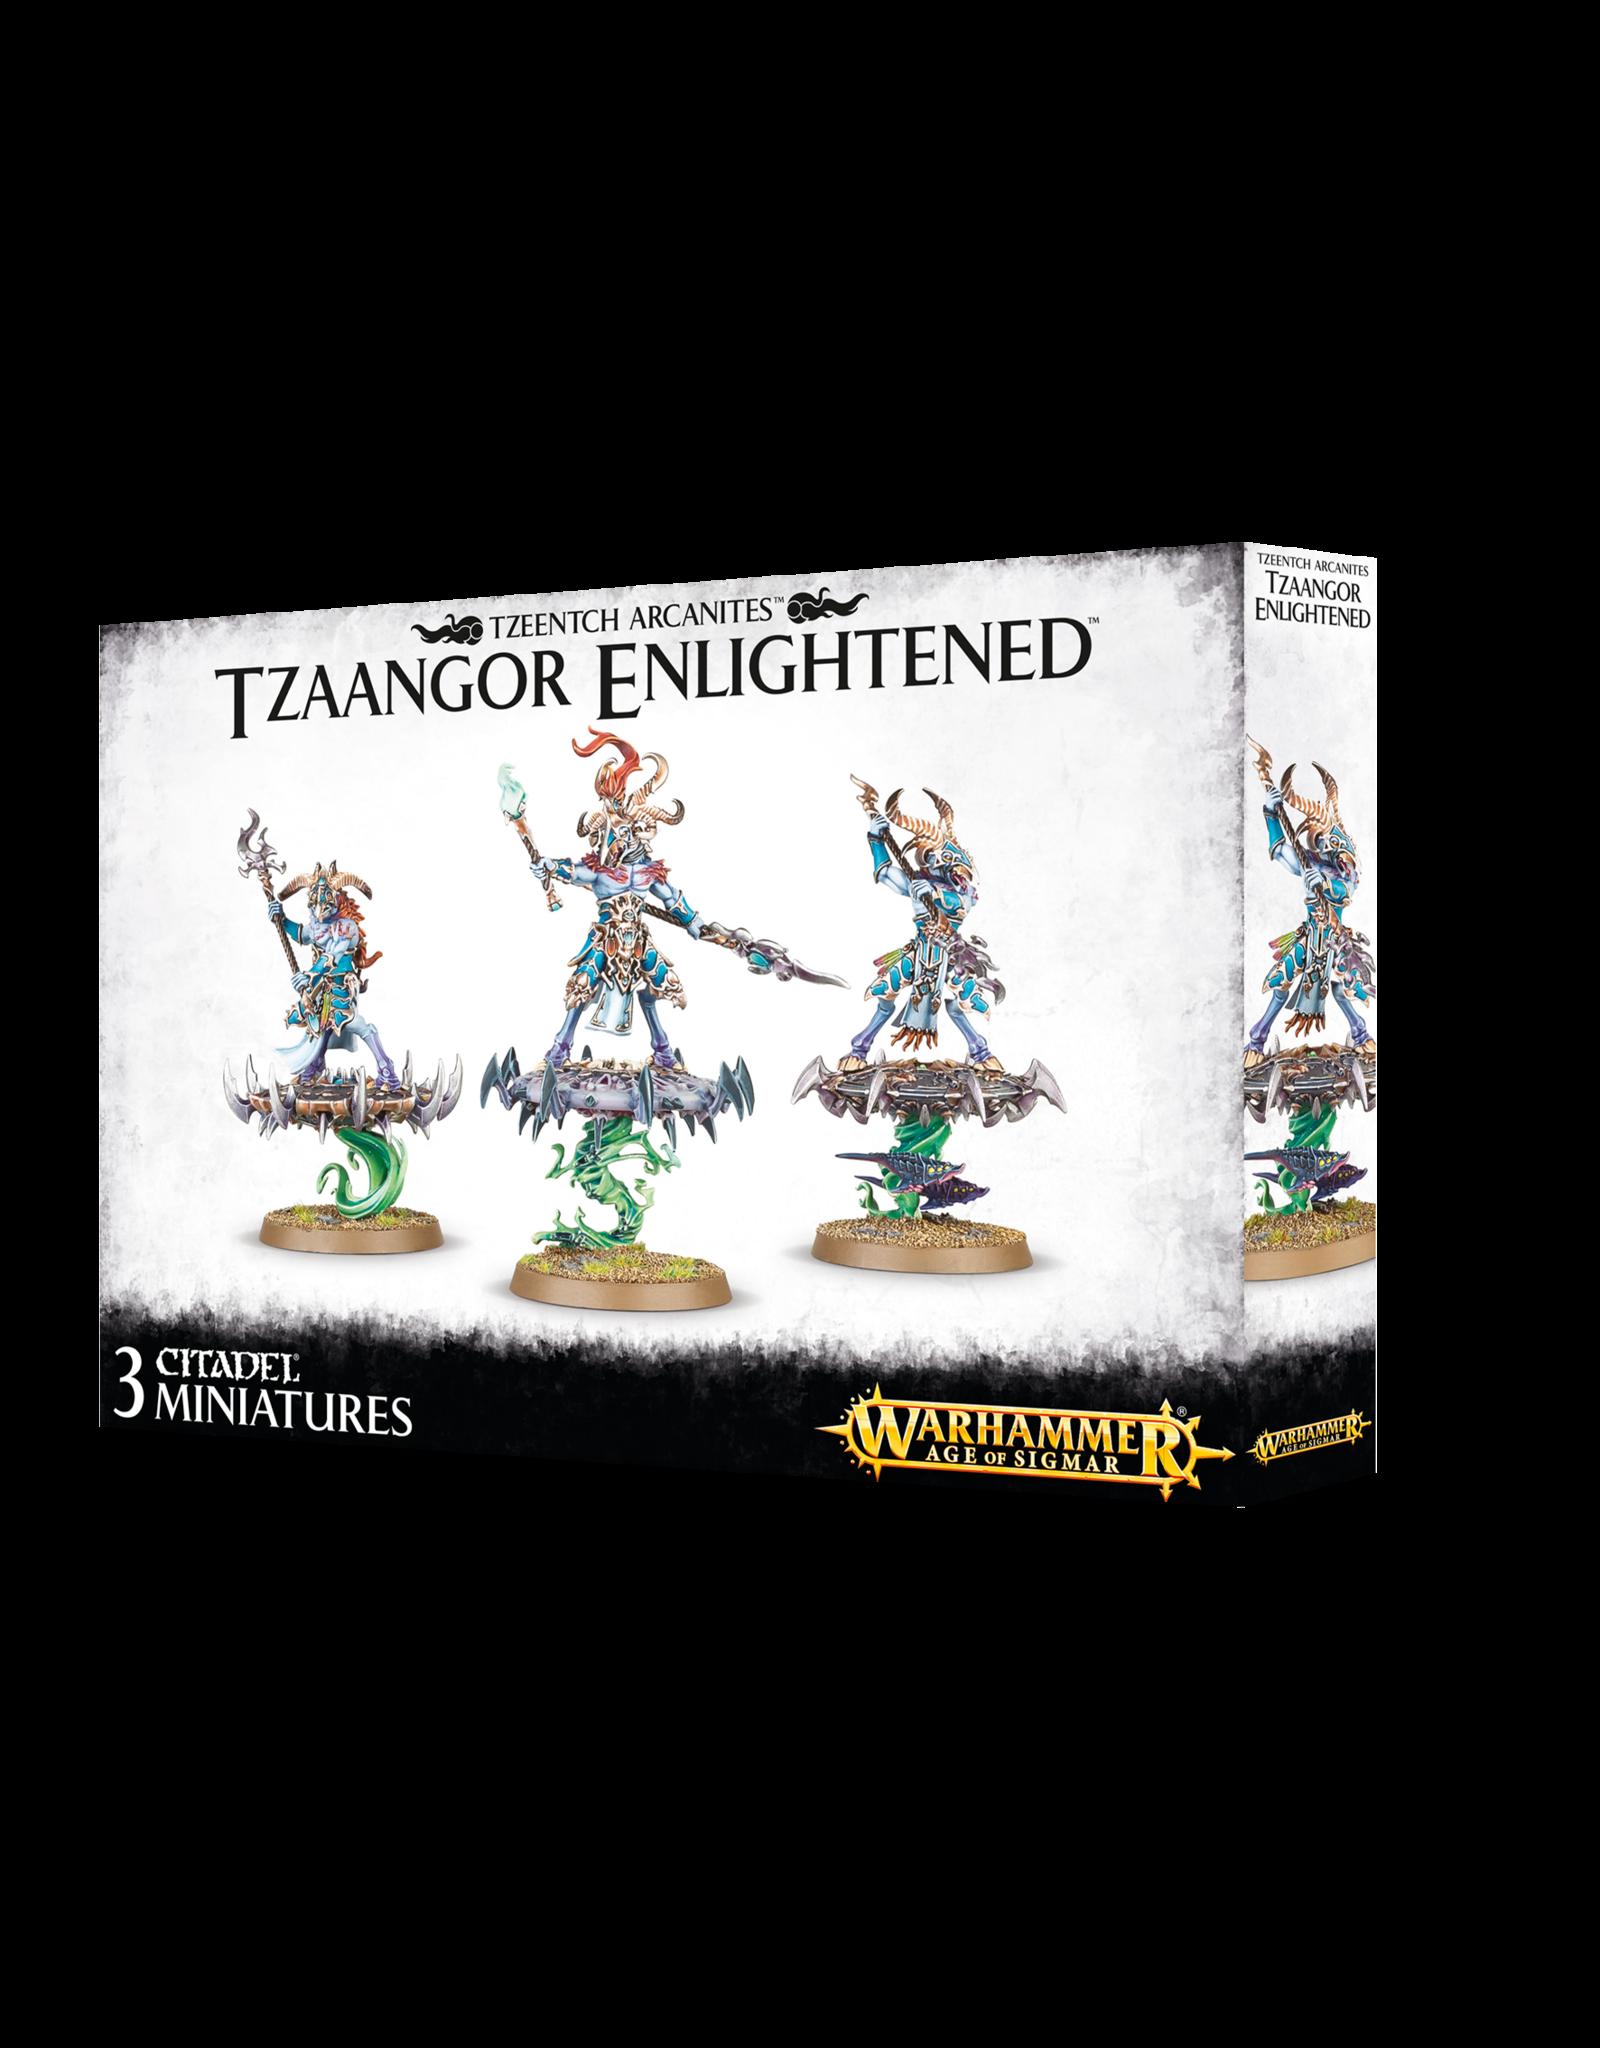 Warhammer Age of Sigmar Tzaangor Enlightened